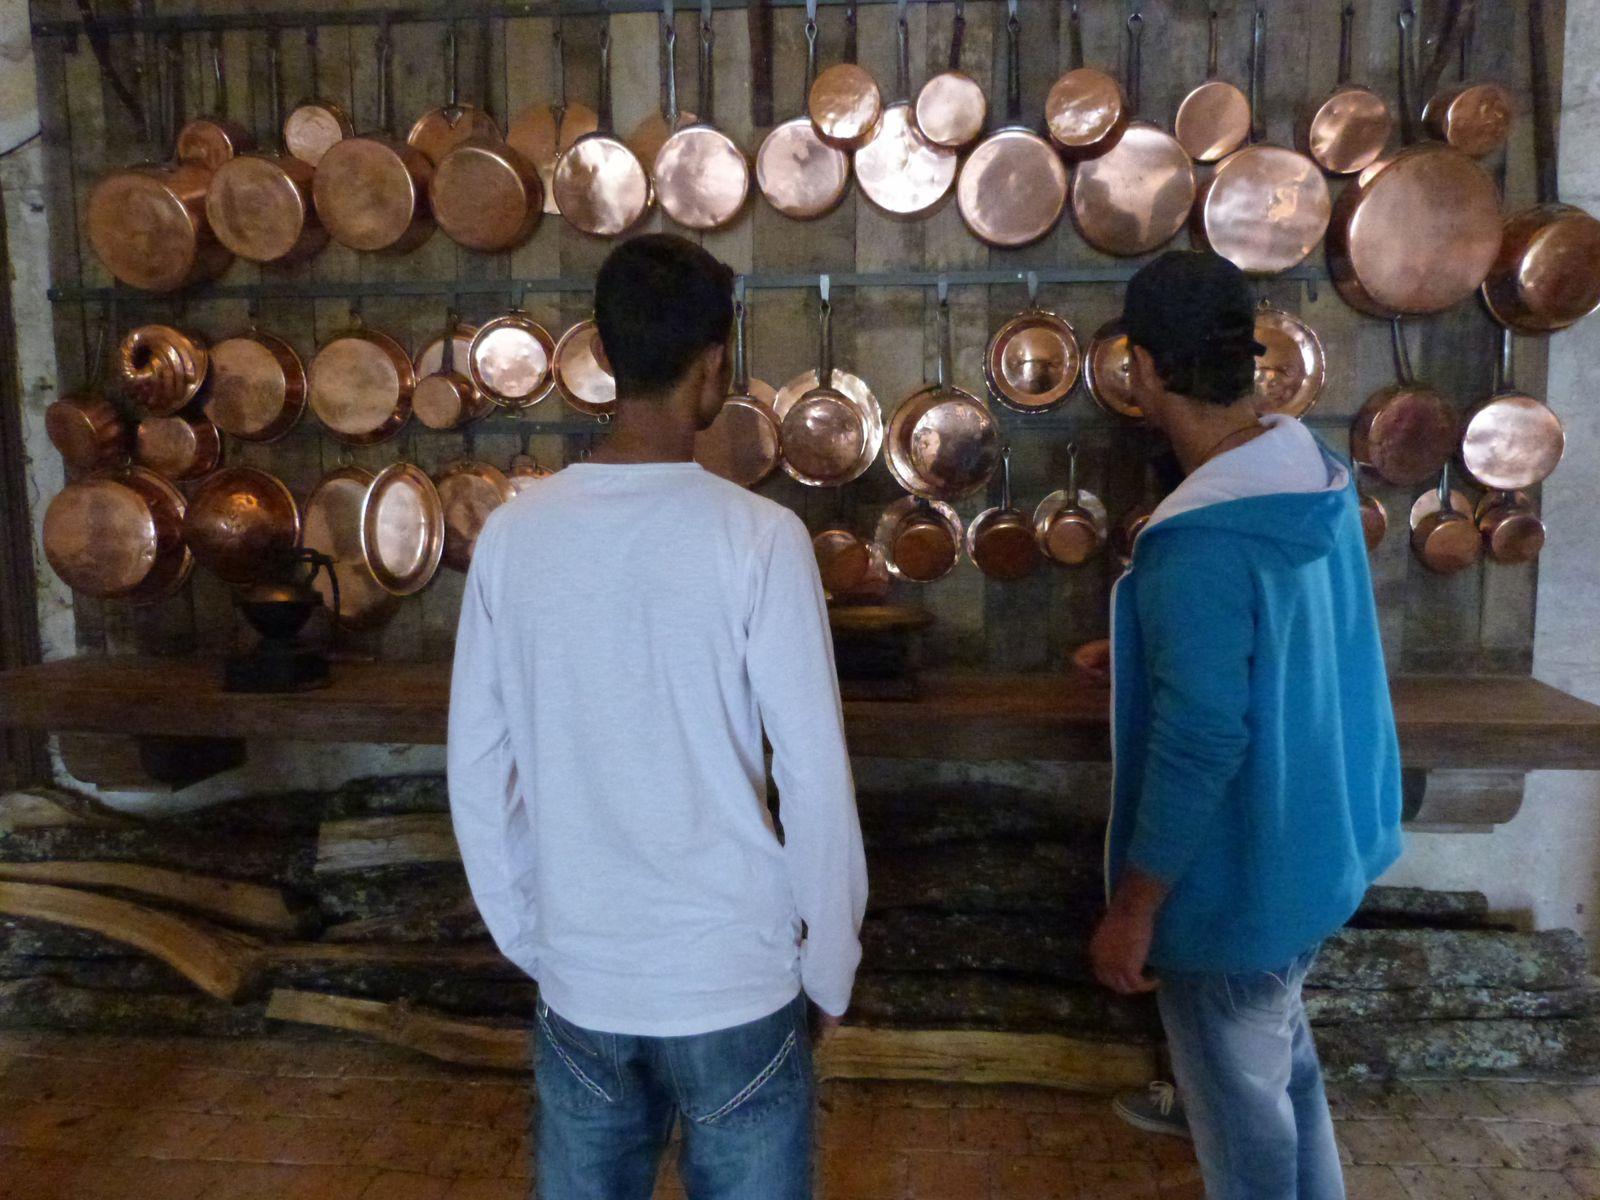 Nos visites au château de Bridoire : Ahad, Adnan, Erzozig, Kamal, Mohamed, Saiful (+ Julian) Alan, Erzorig, Kévin